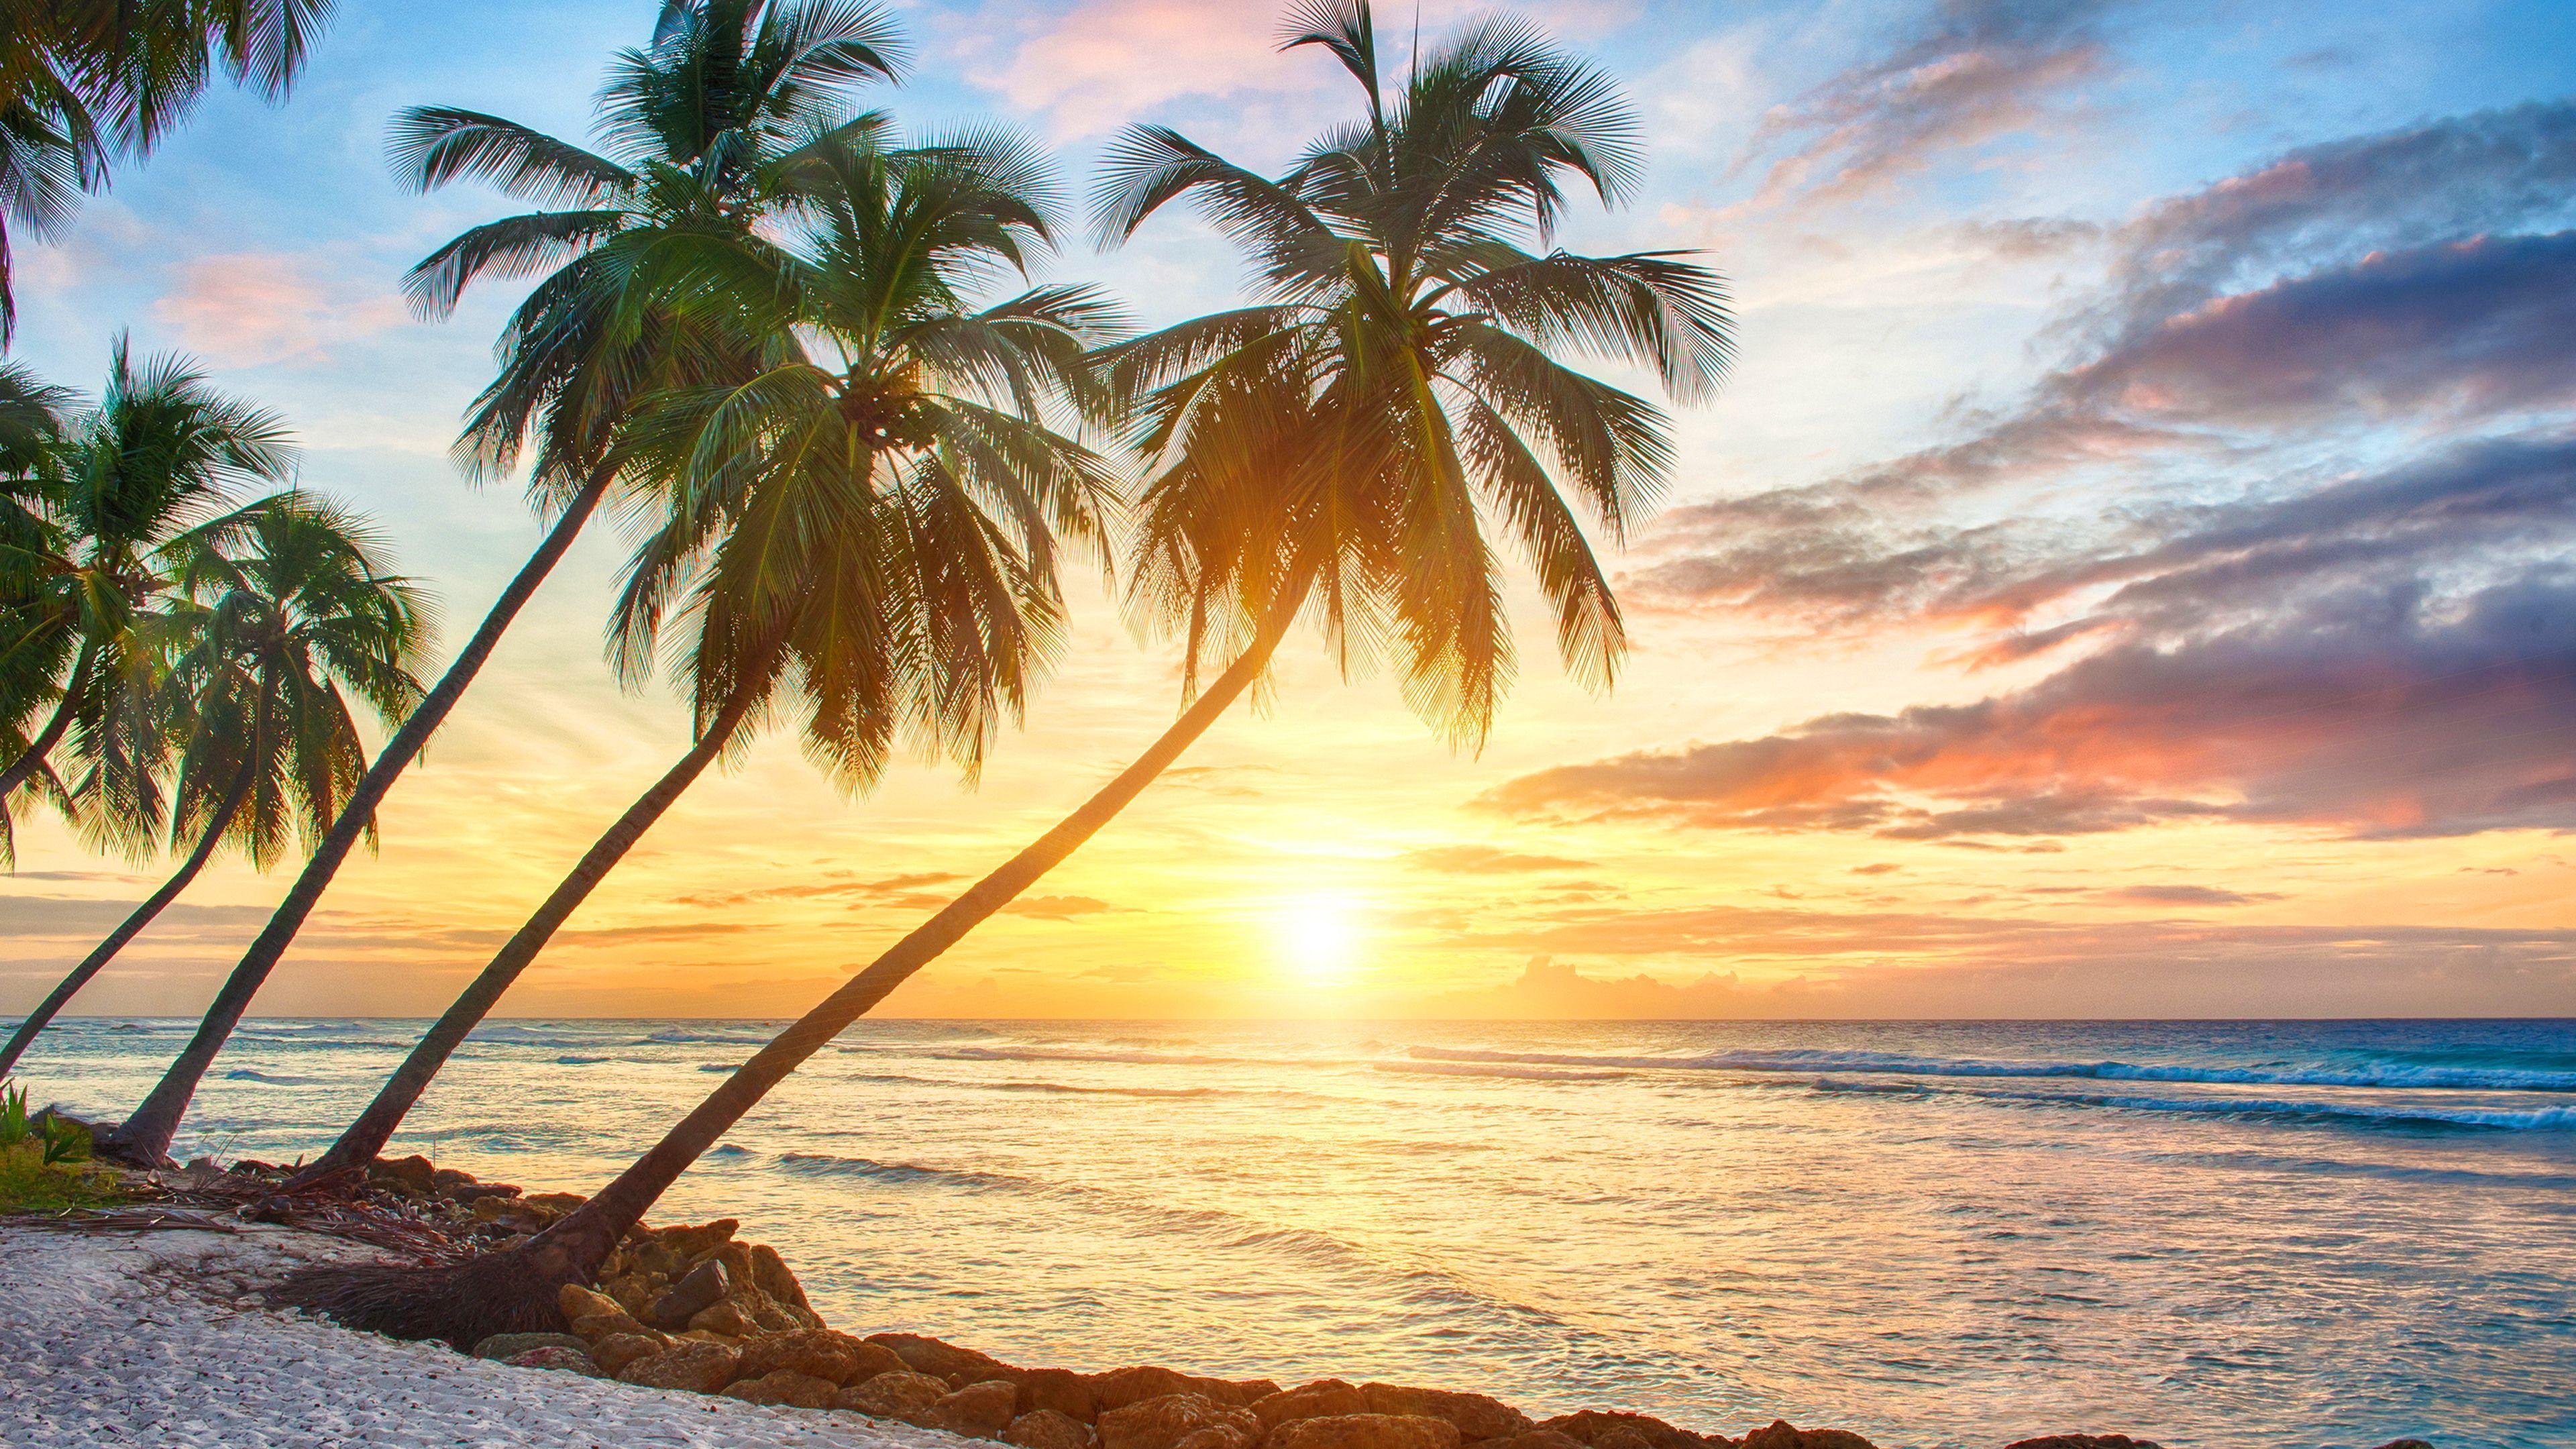 Hd Tropical Island Beach Paradise Wallpapers And Backgrounds: TROPICAL WALLPAPERS 2017